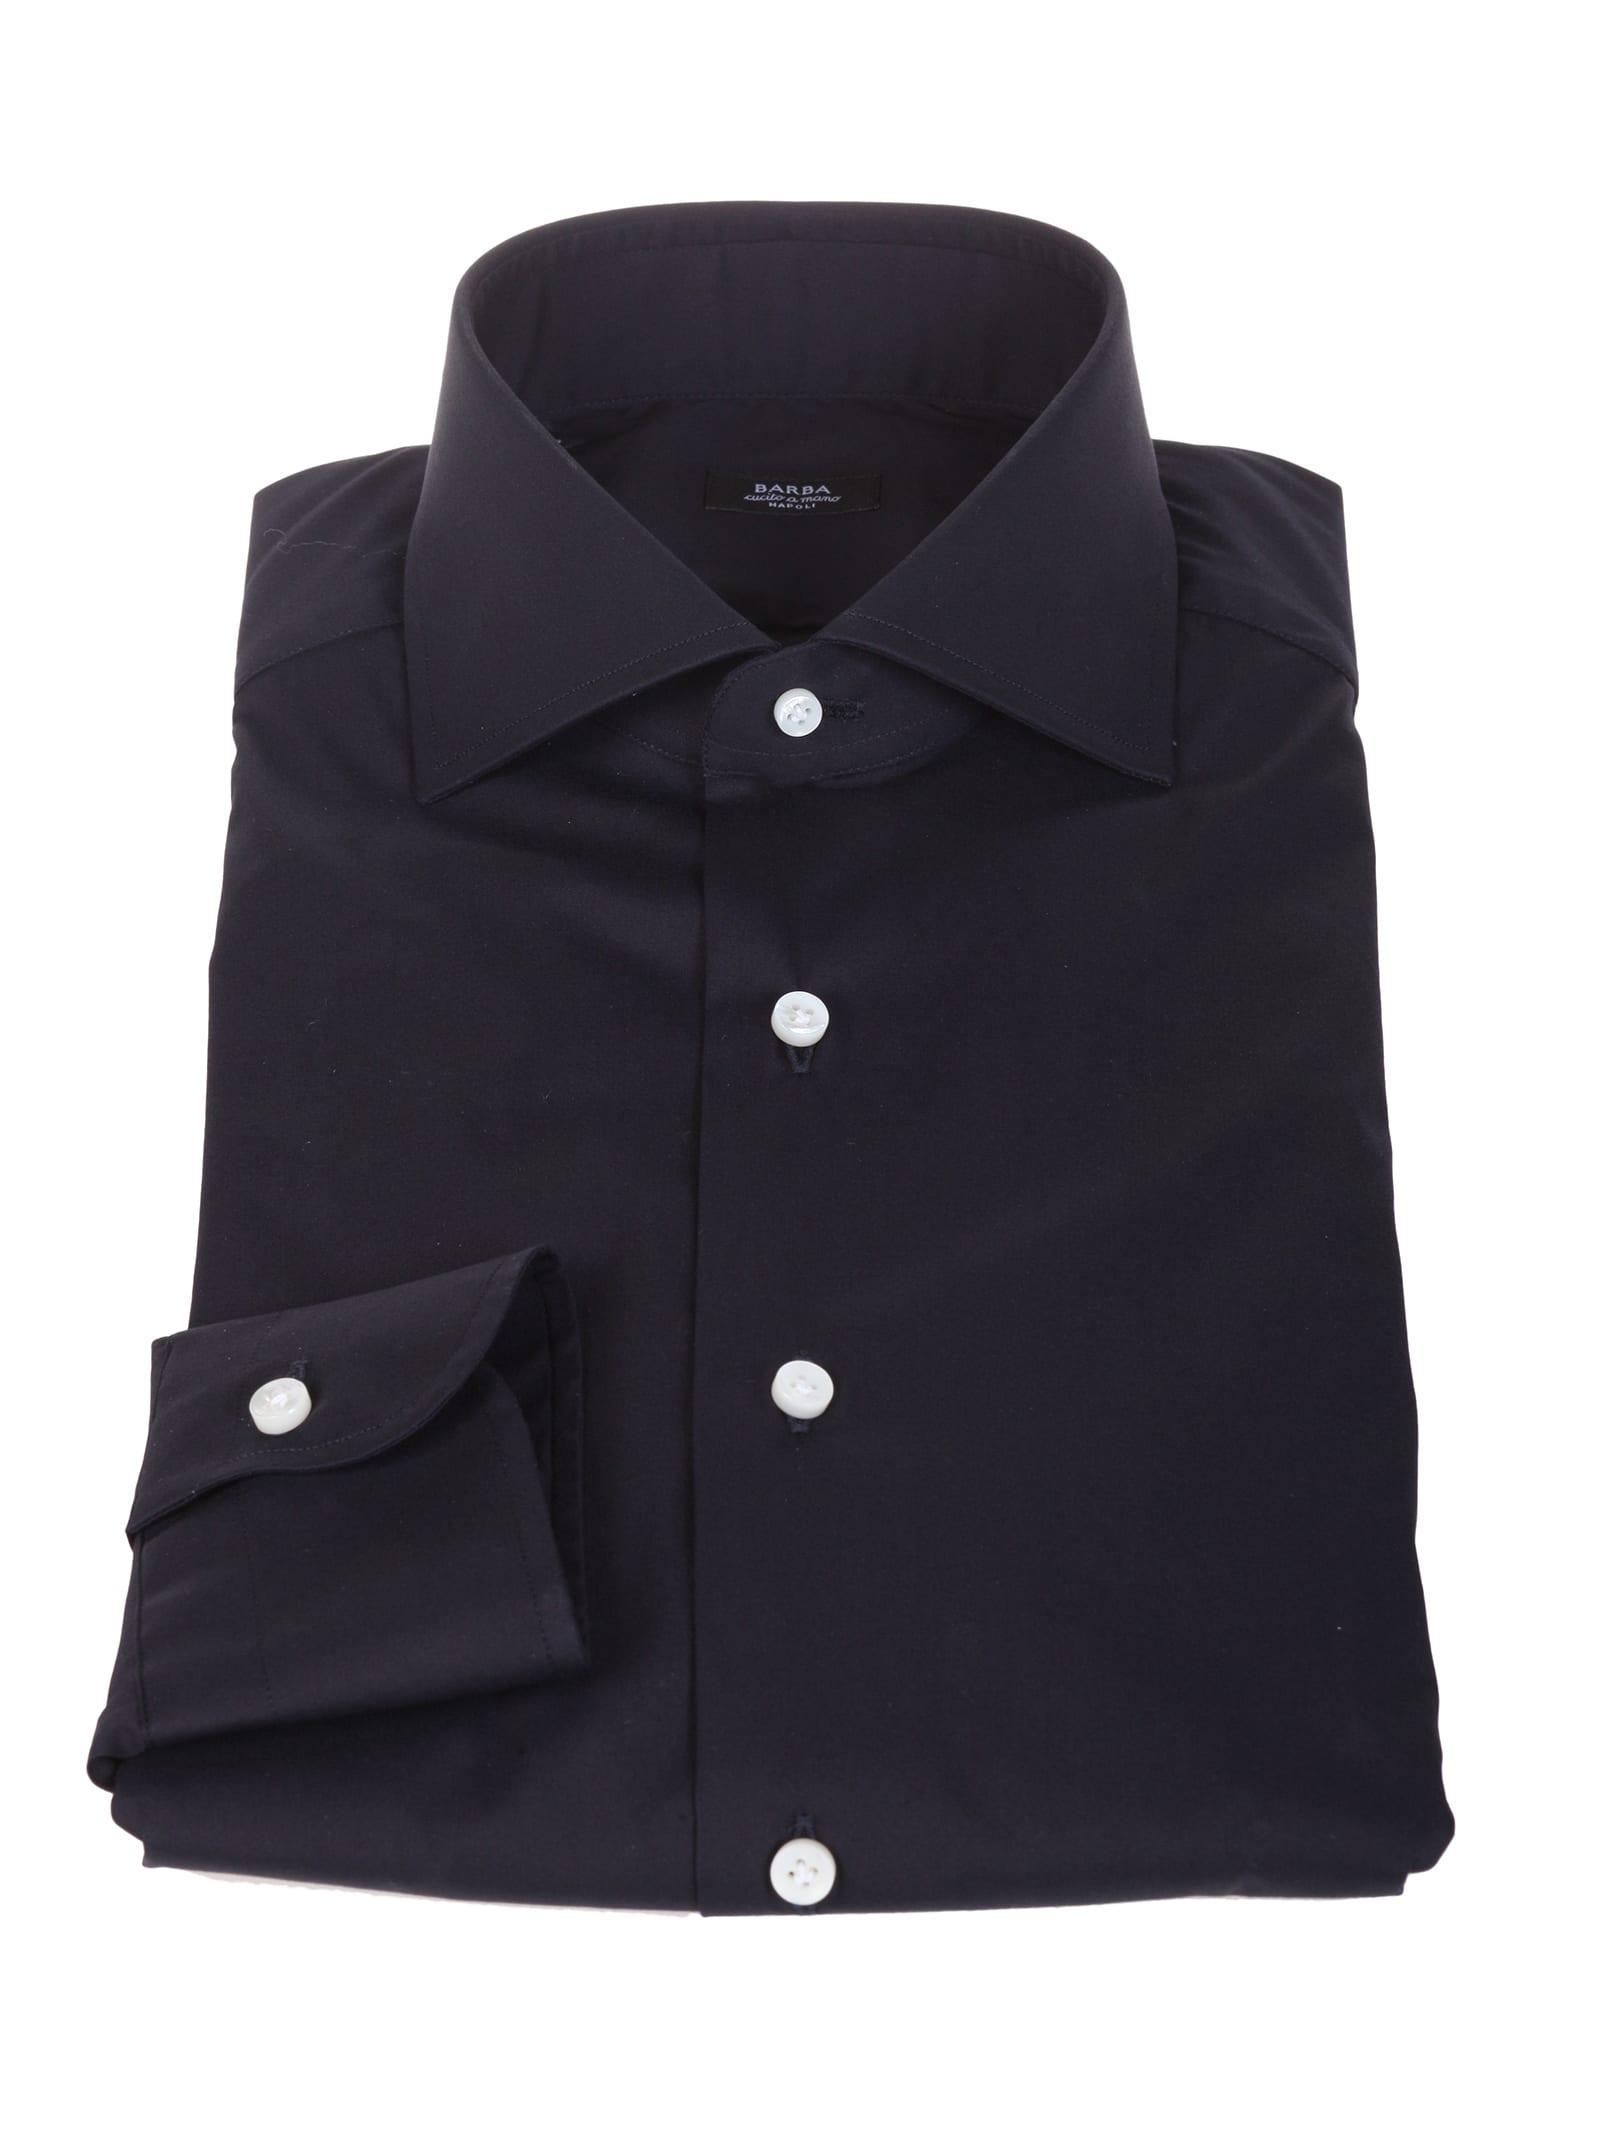 Barba blue cotton shirt